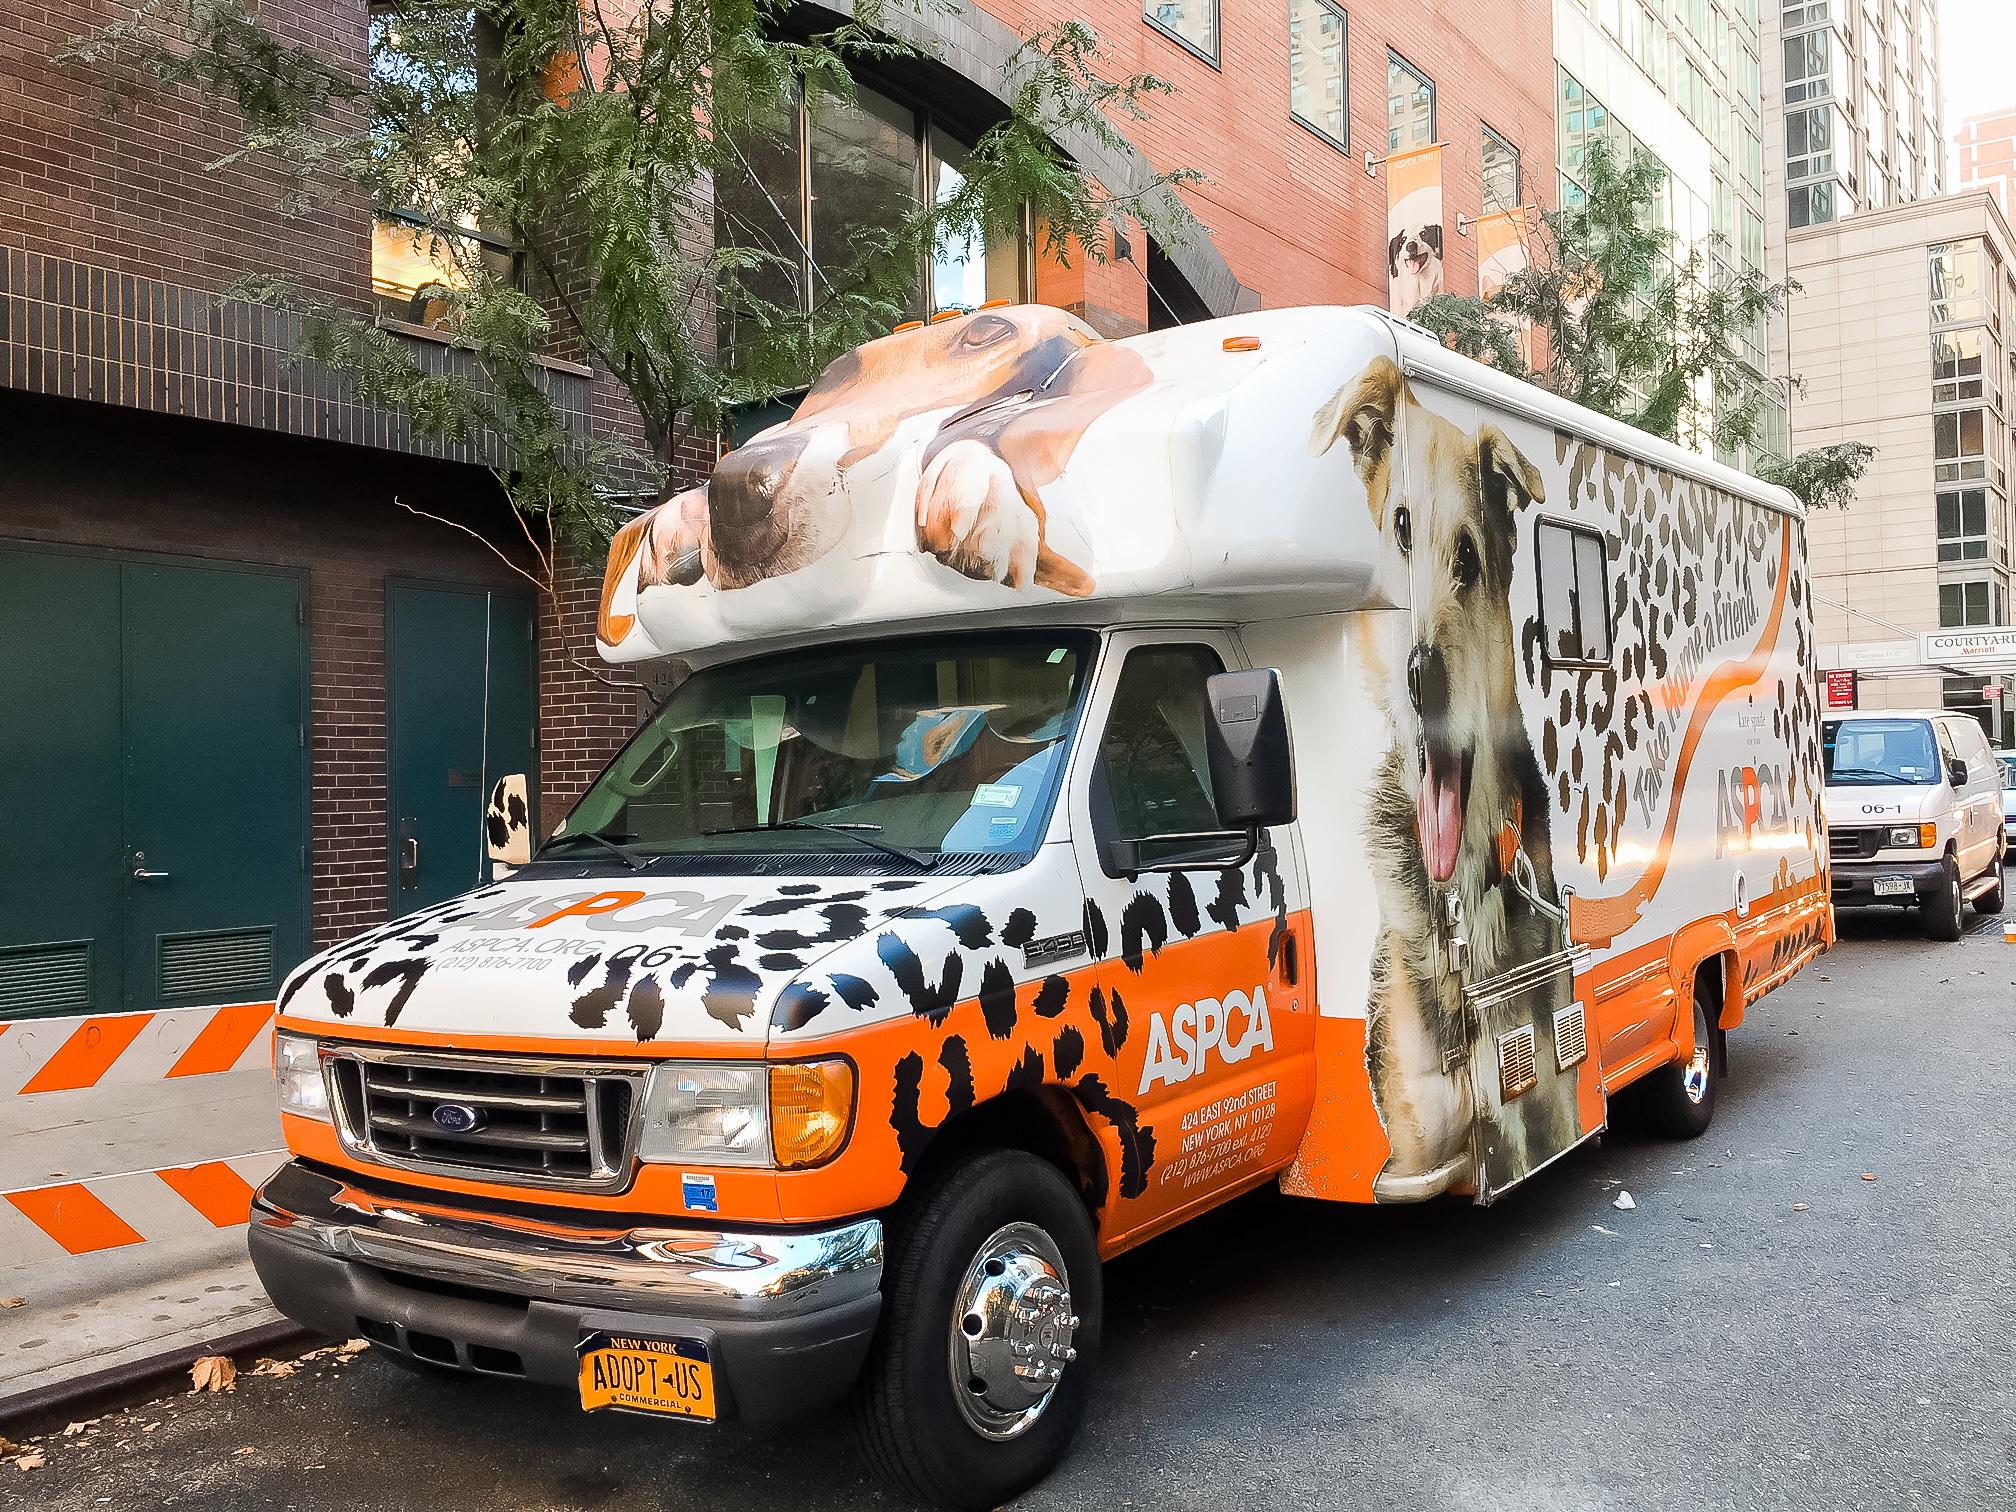 ASPCA x Kate Spade Vehicle